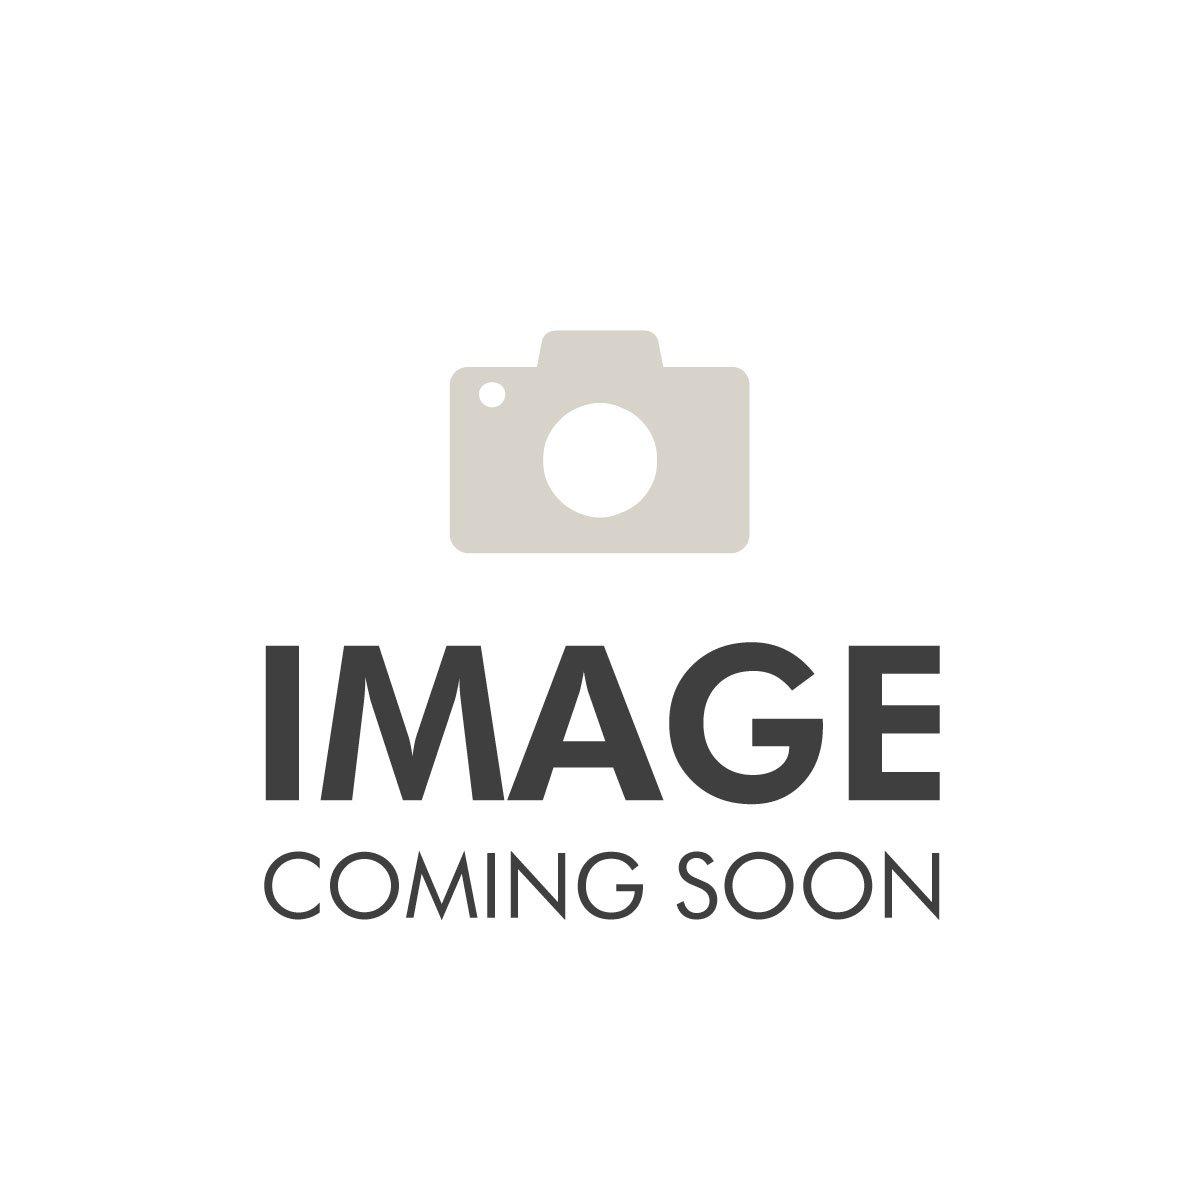 Thierry Mugler Mugler Aura 200ml Shower Milk